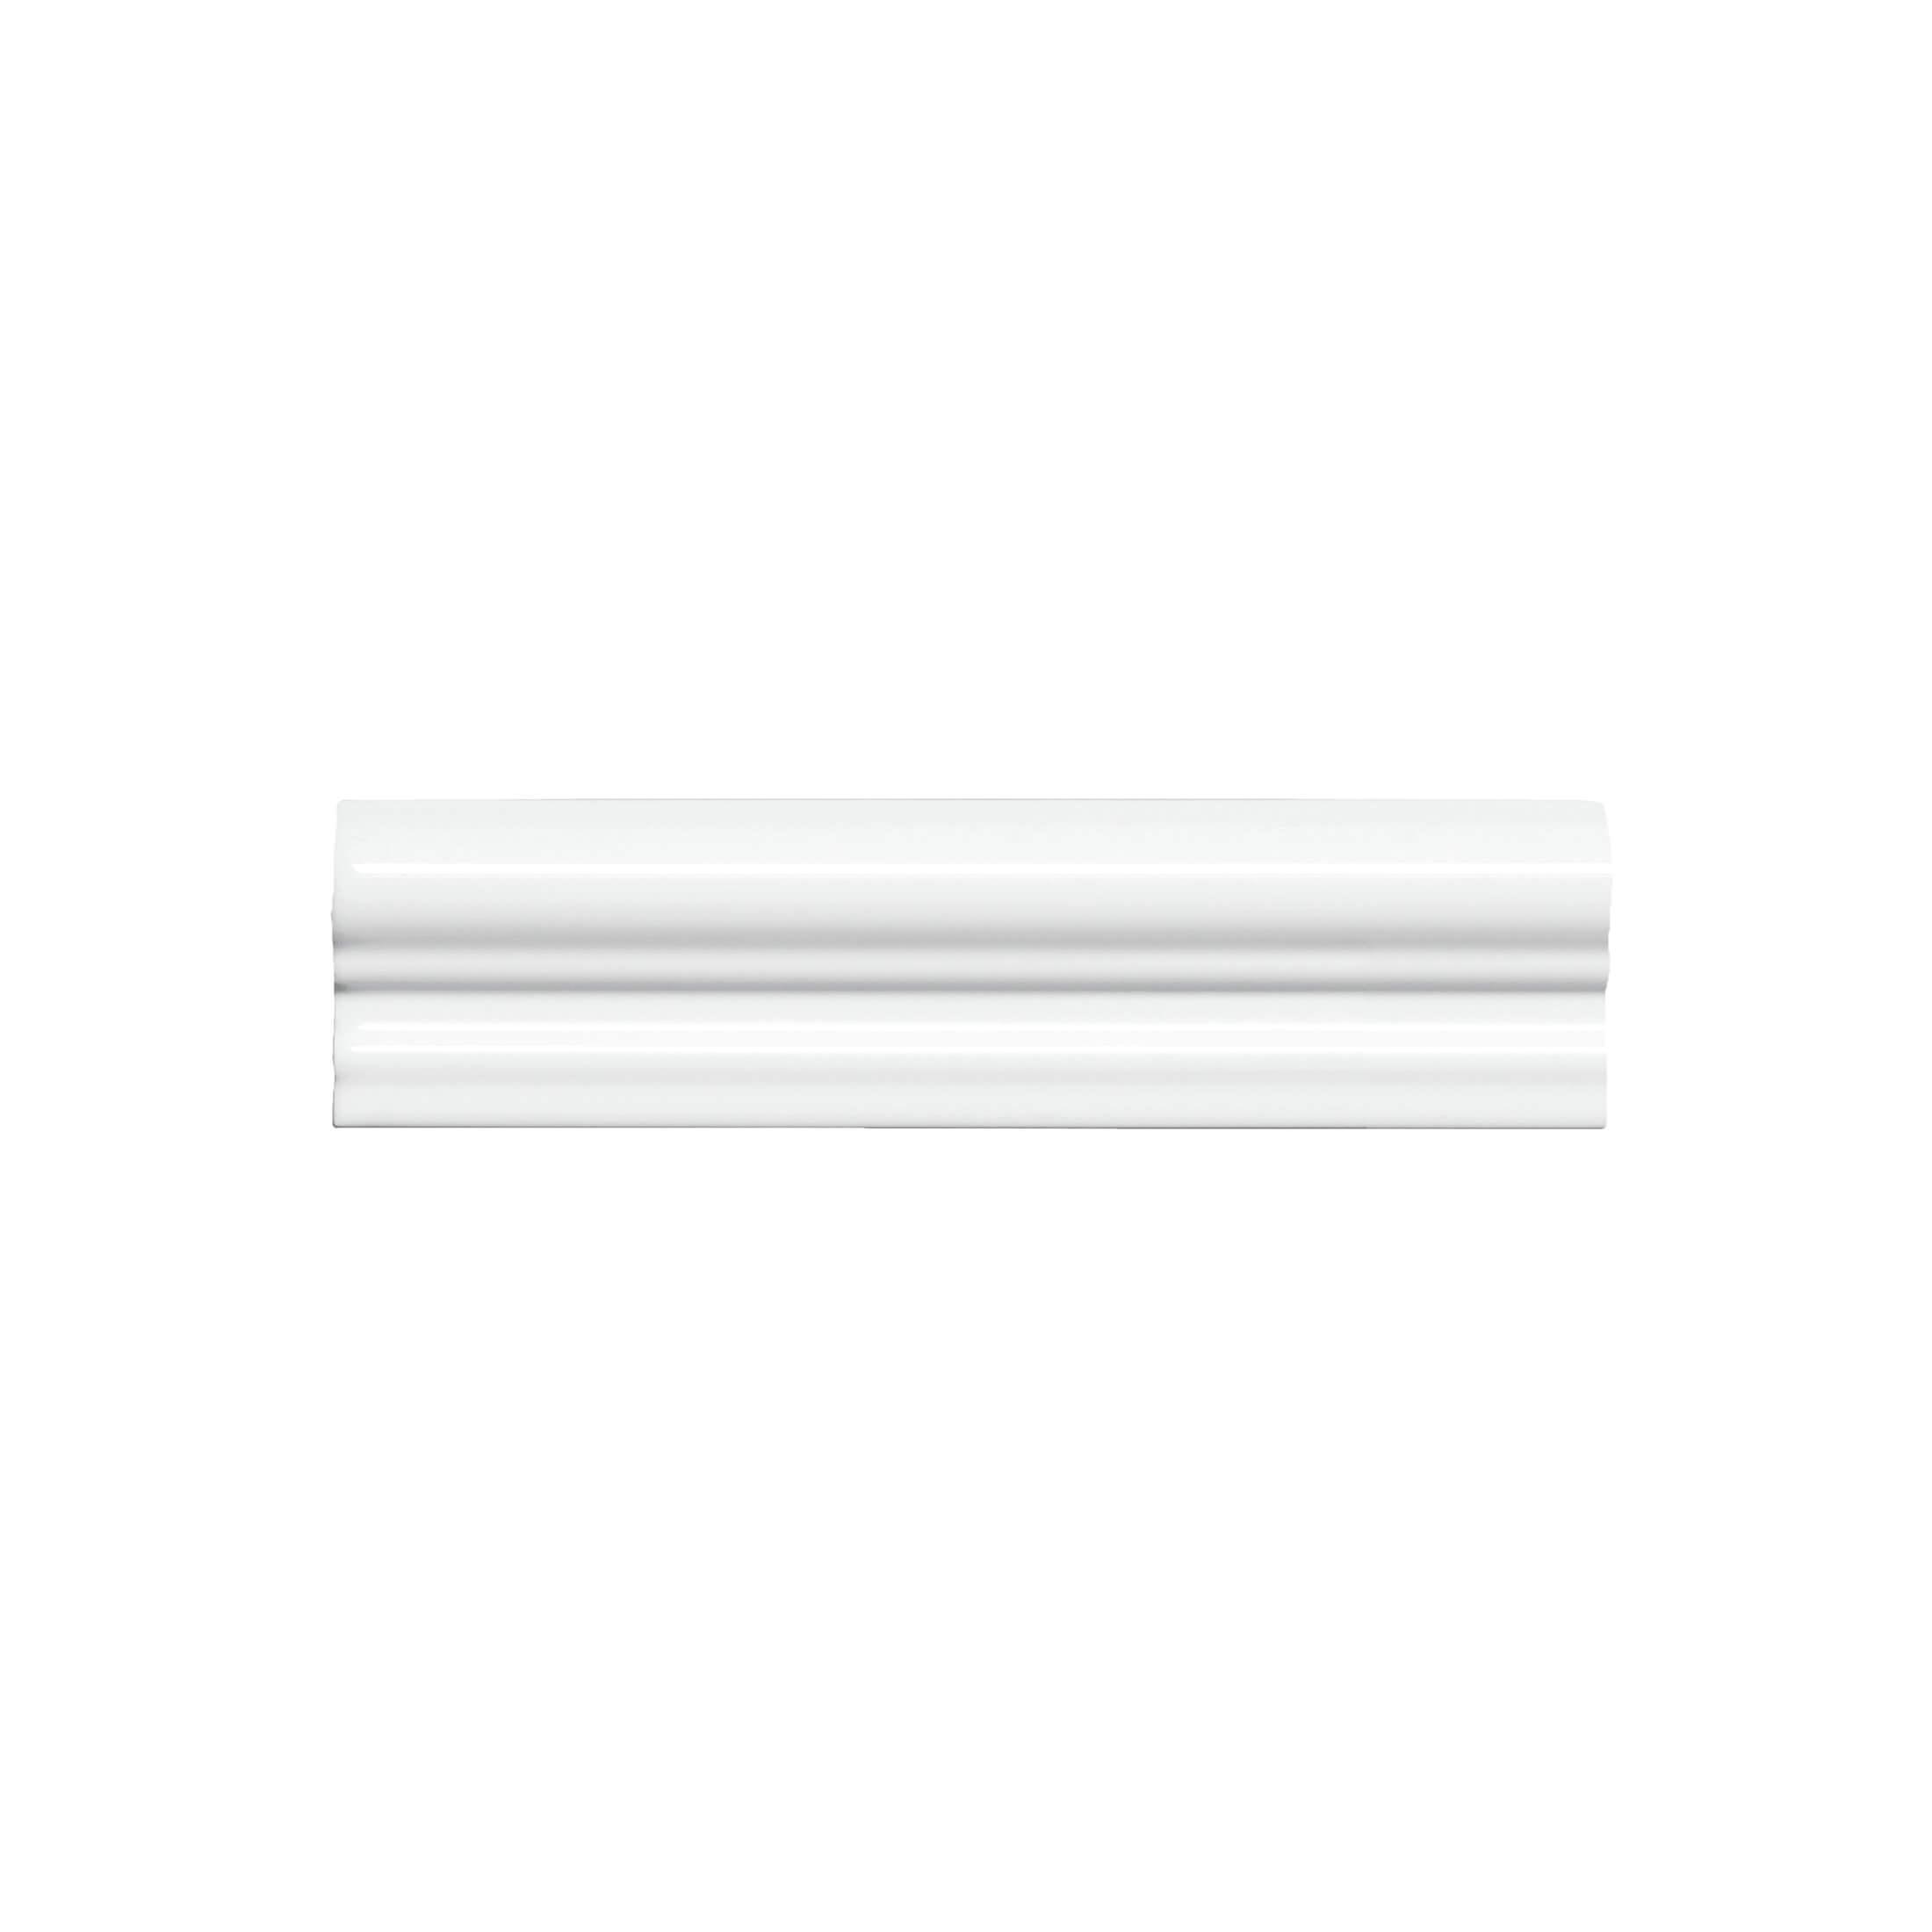 ADEX-ADNE5170-MOLDURA-ITALIANA PB -5 cm-20 cm-NERI>BLANCO Z